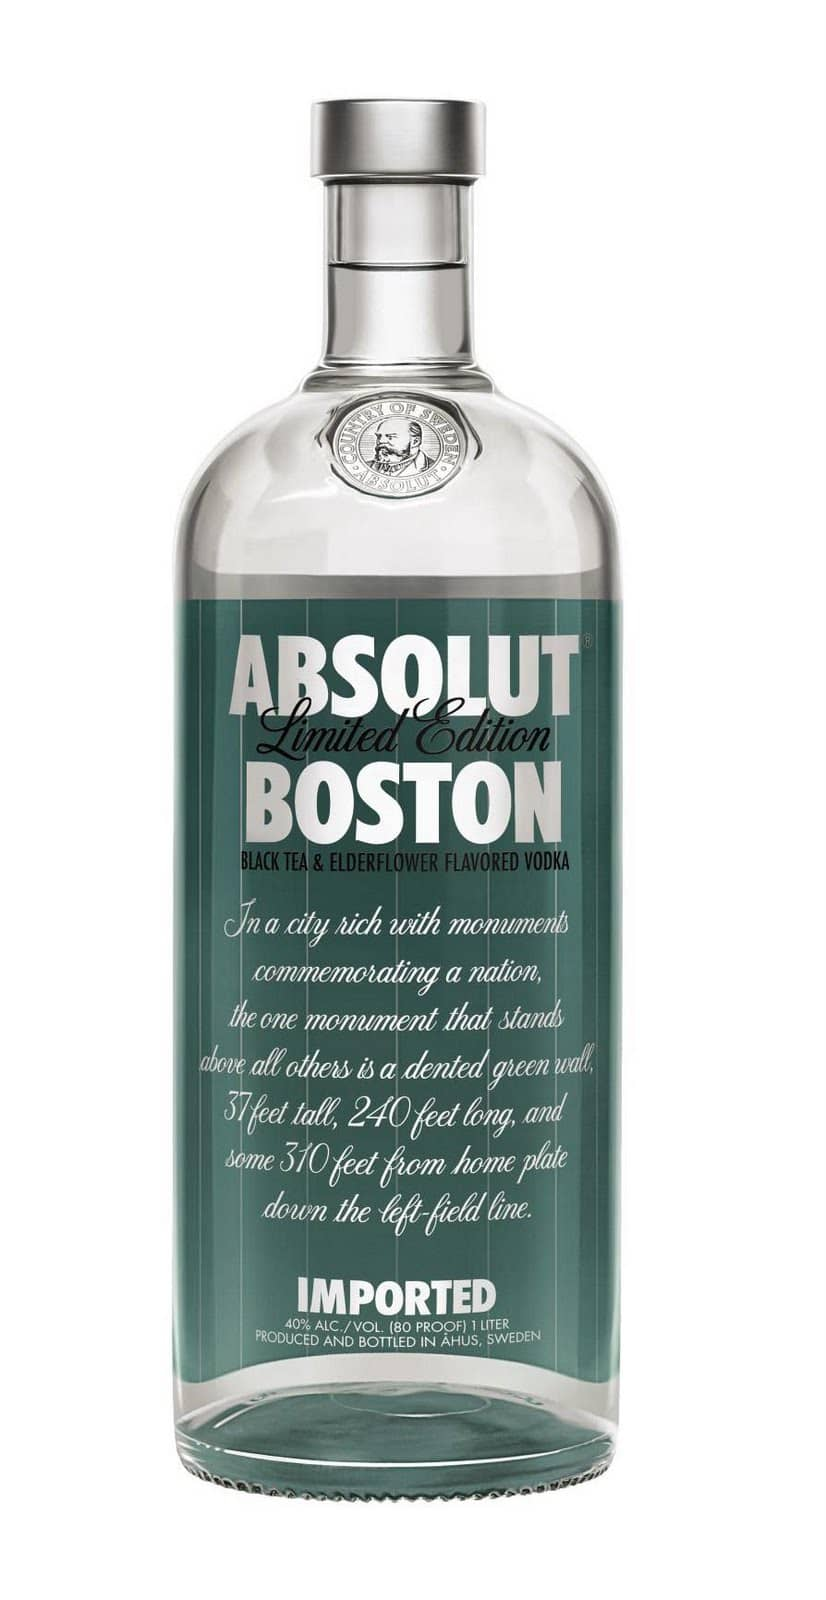 BostonBottle-R1